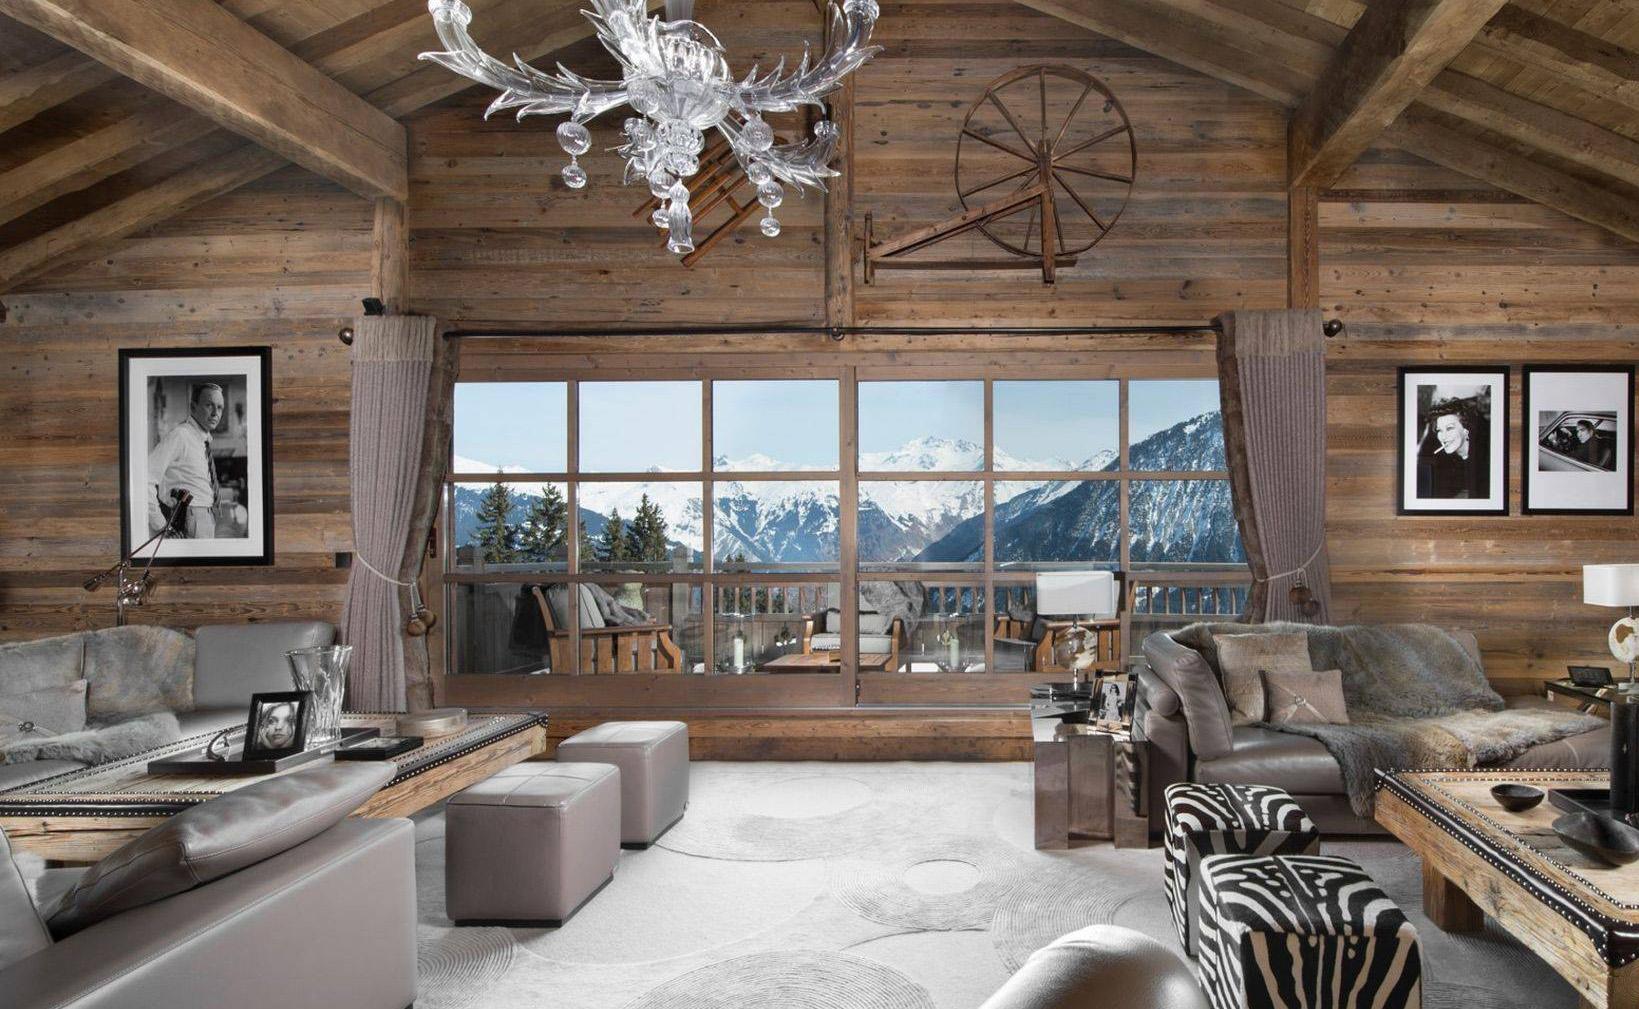 Lovelydays luxury service apartment rental - Courchevel - Great Roc Chalet - Partner - 7 bedrooms - 6 bathrooms - Luxury living room - 55c189aec416 - Lovelydays